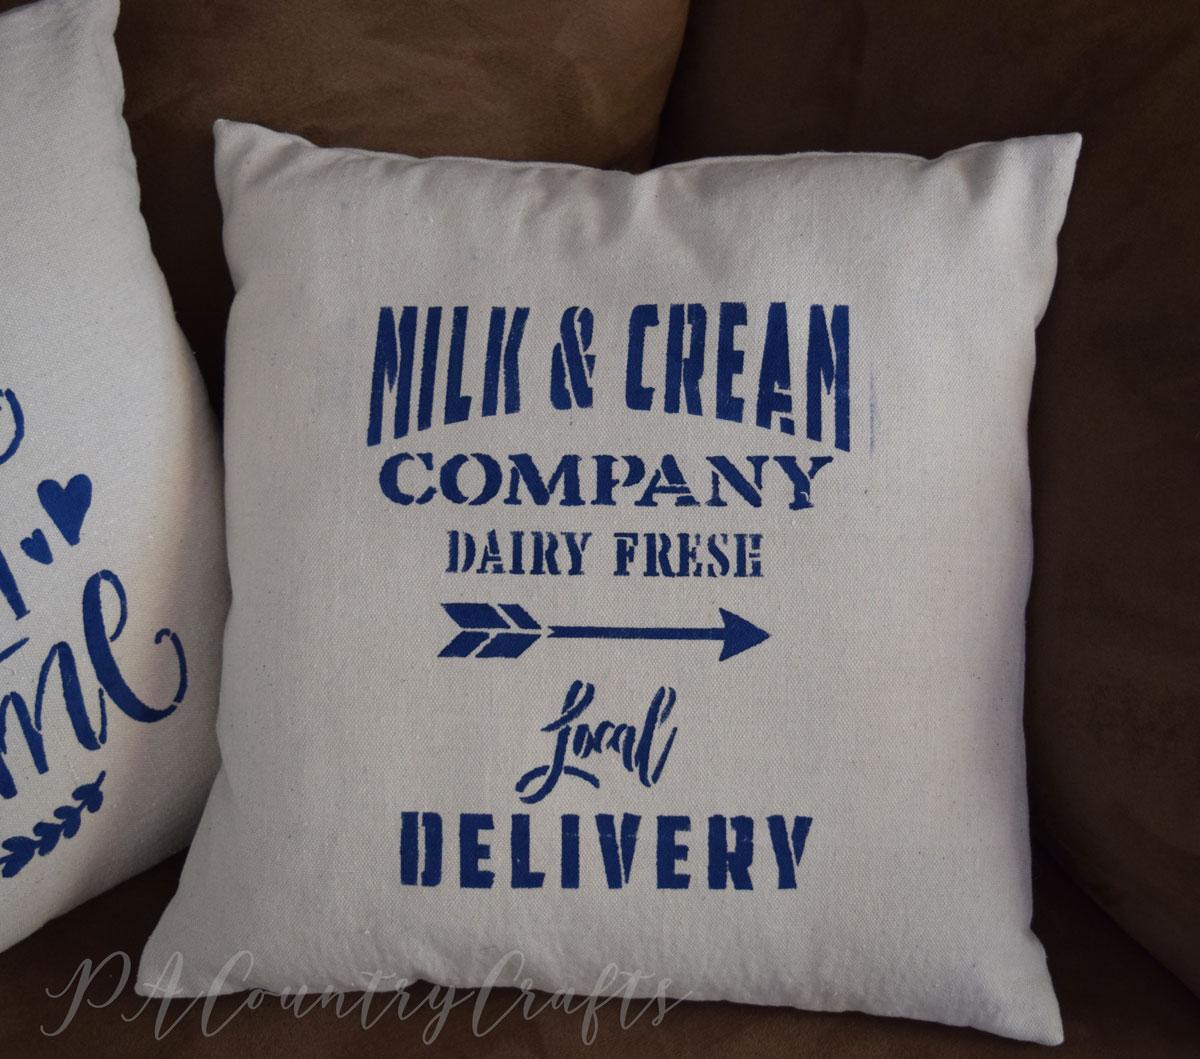 Farmhouse Stencil Pillow Cover Tutorial